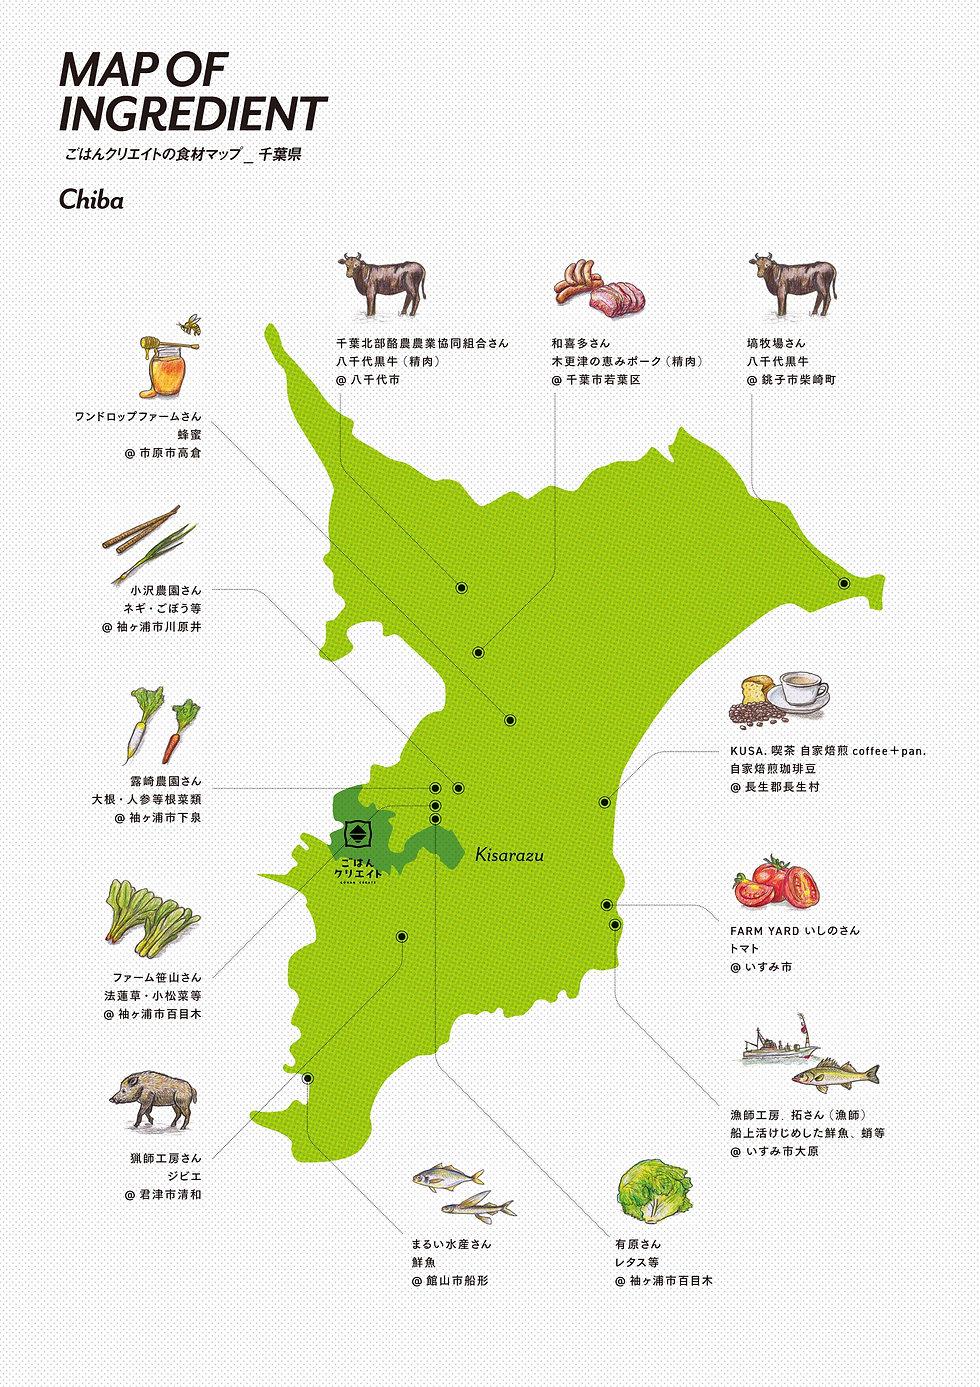 farmer-map_chiba.jpg